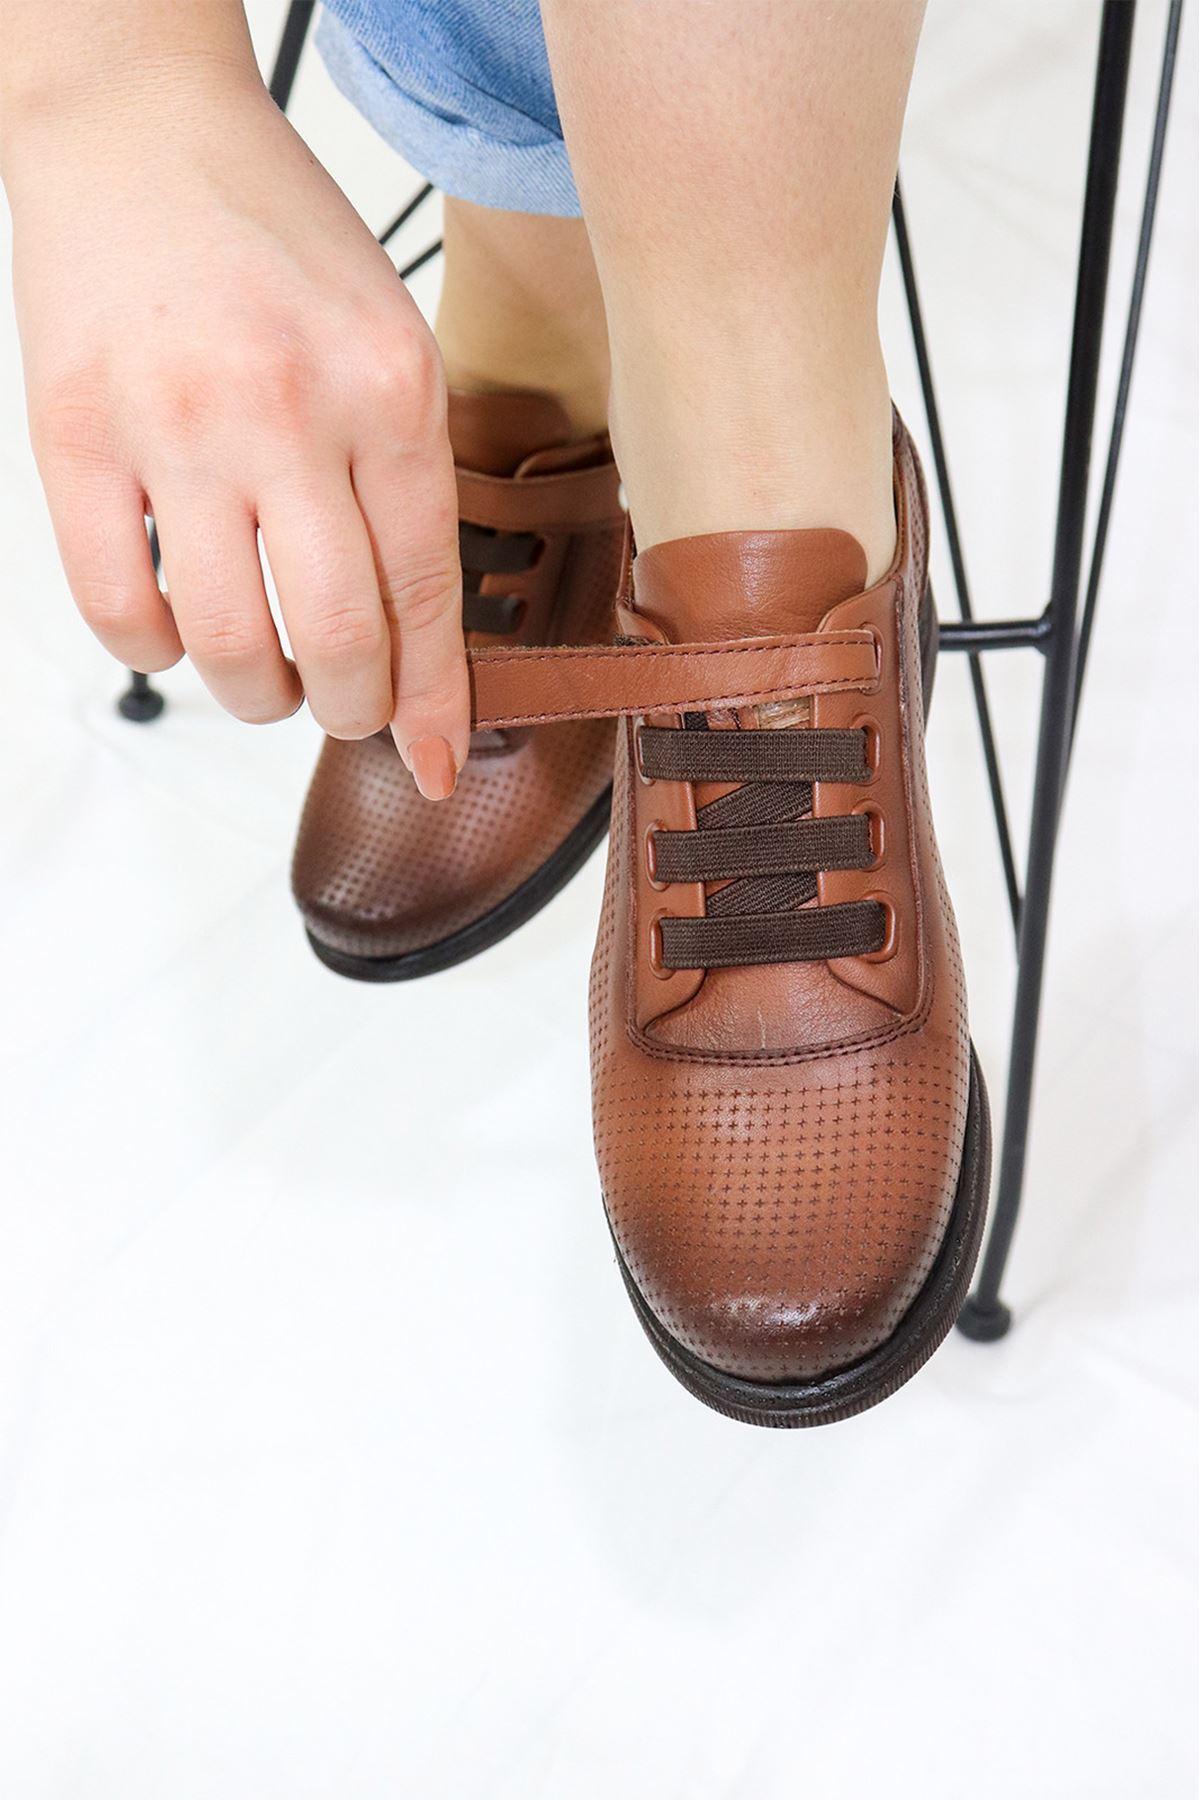 Mammamia - D21YA - 3075-B Taba Kadın Ayakkabısı